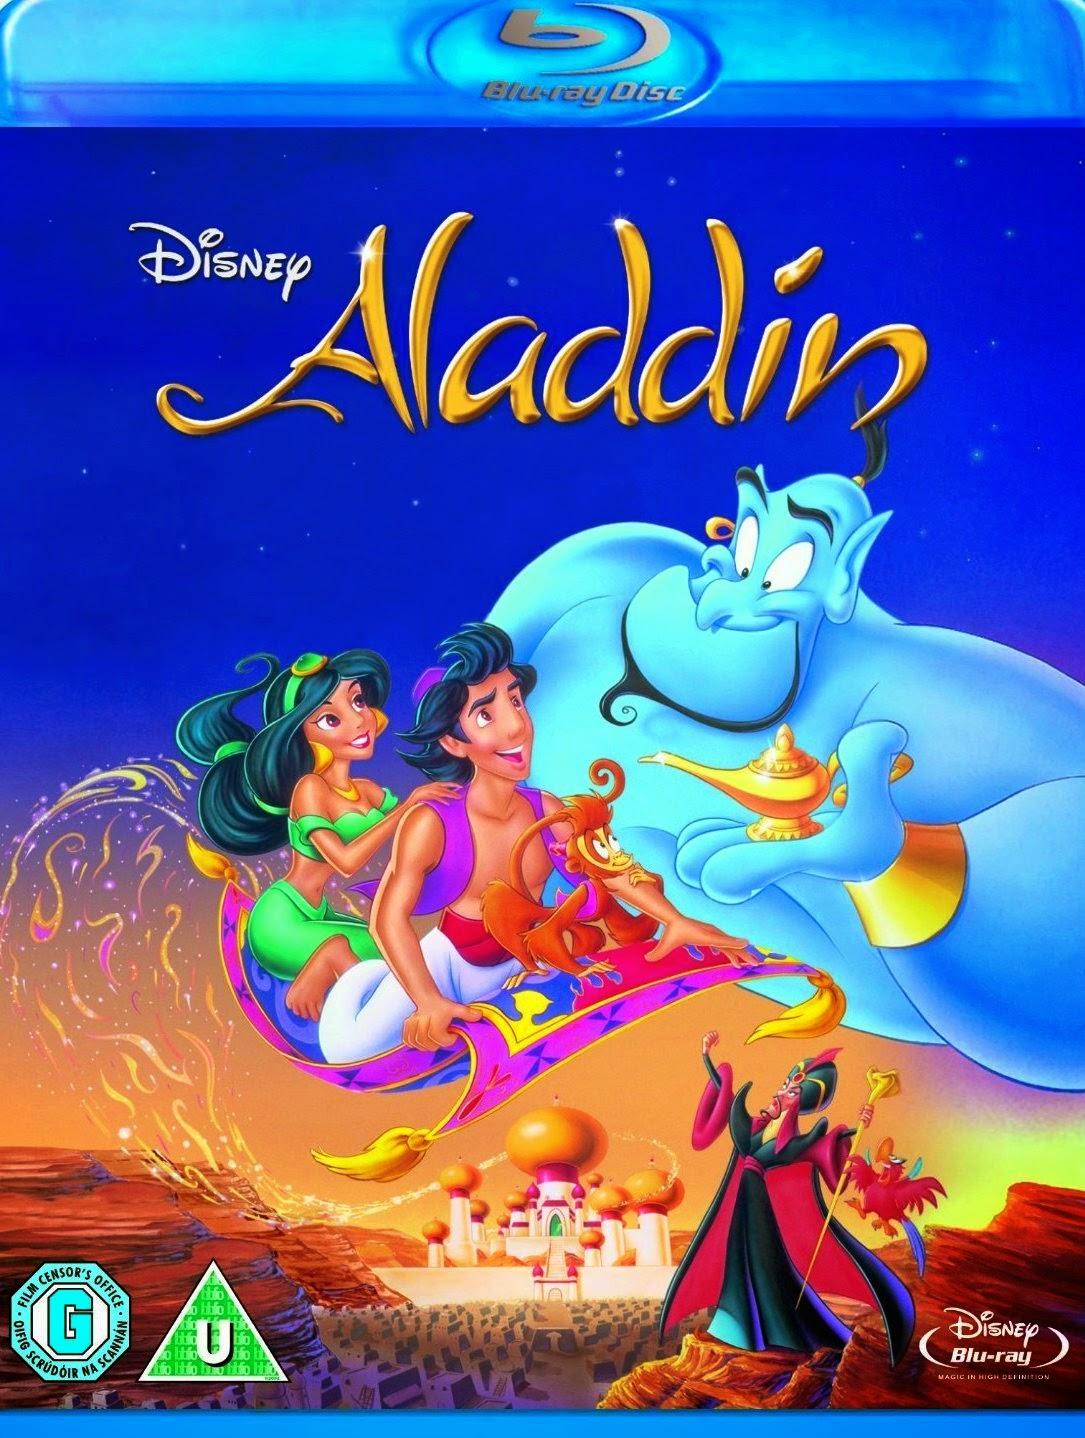 ALADDIN Blu Ray Walt Disney Pictures 1992 Home Video